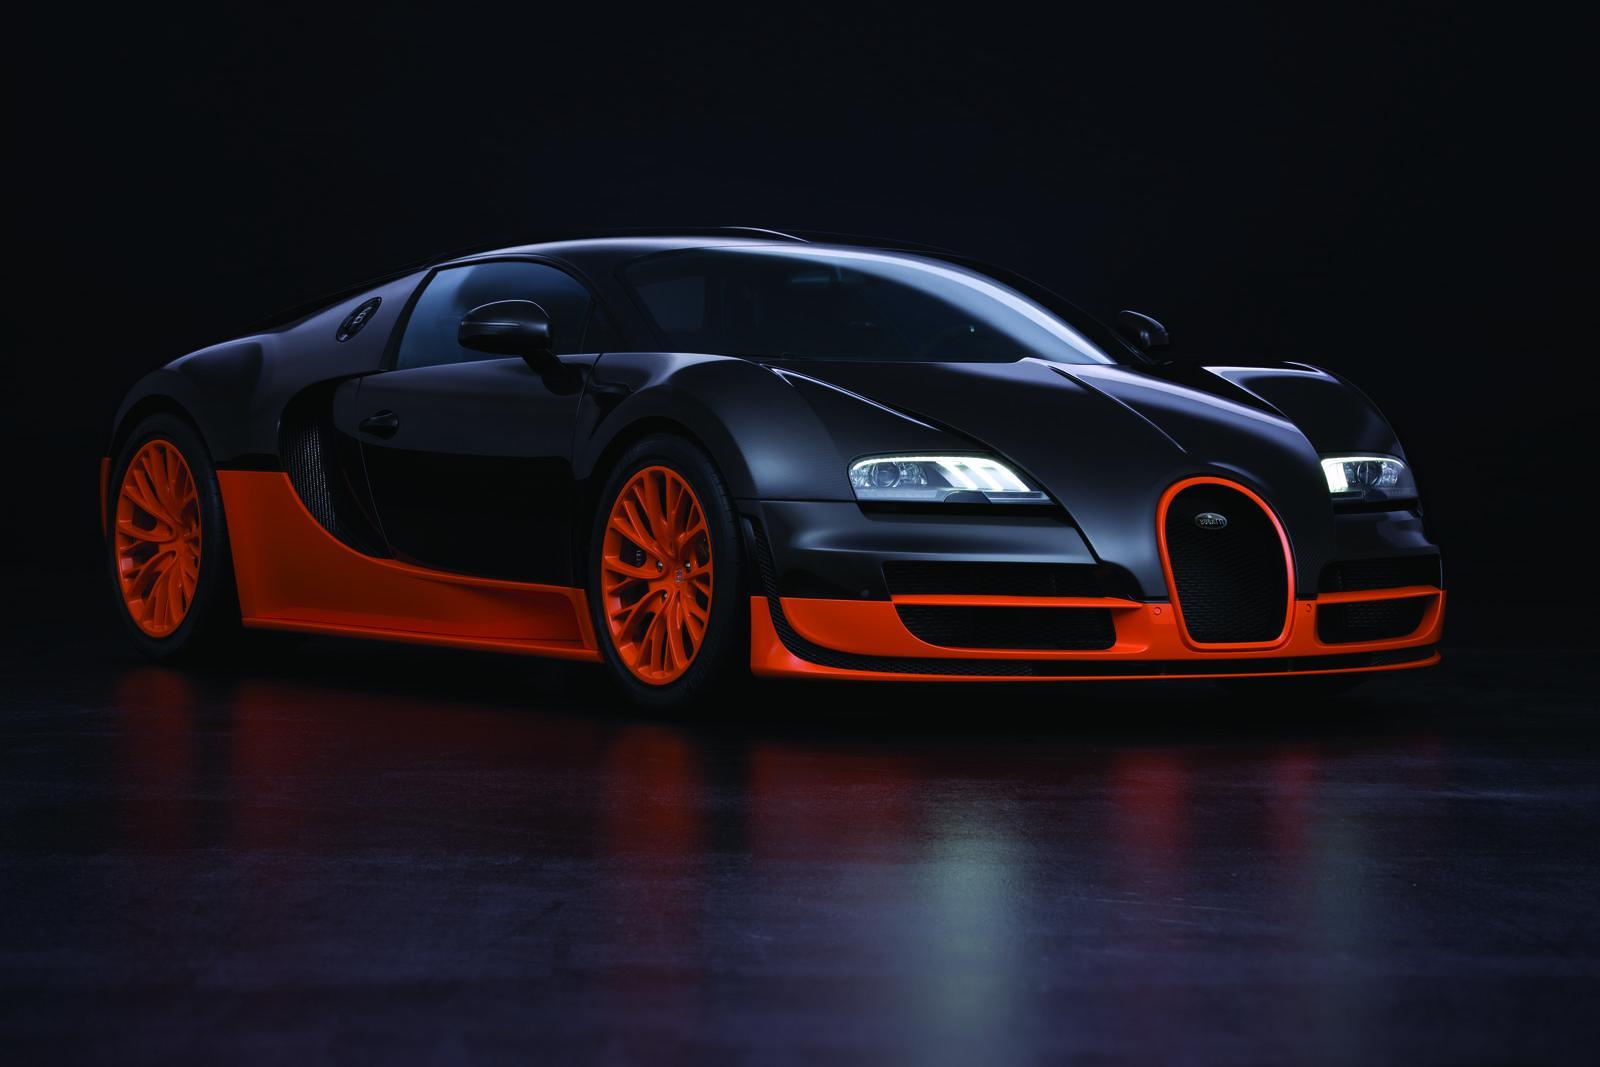 2011 Bugatti Veyron Super Sport Cars Sketches